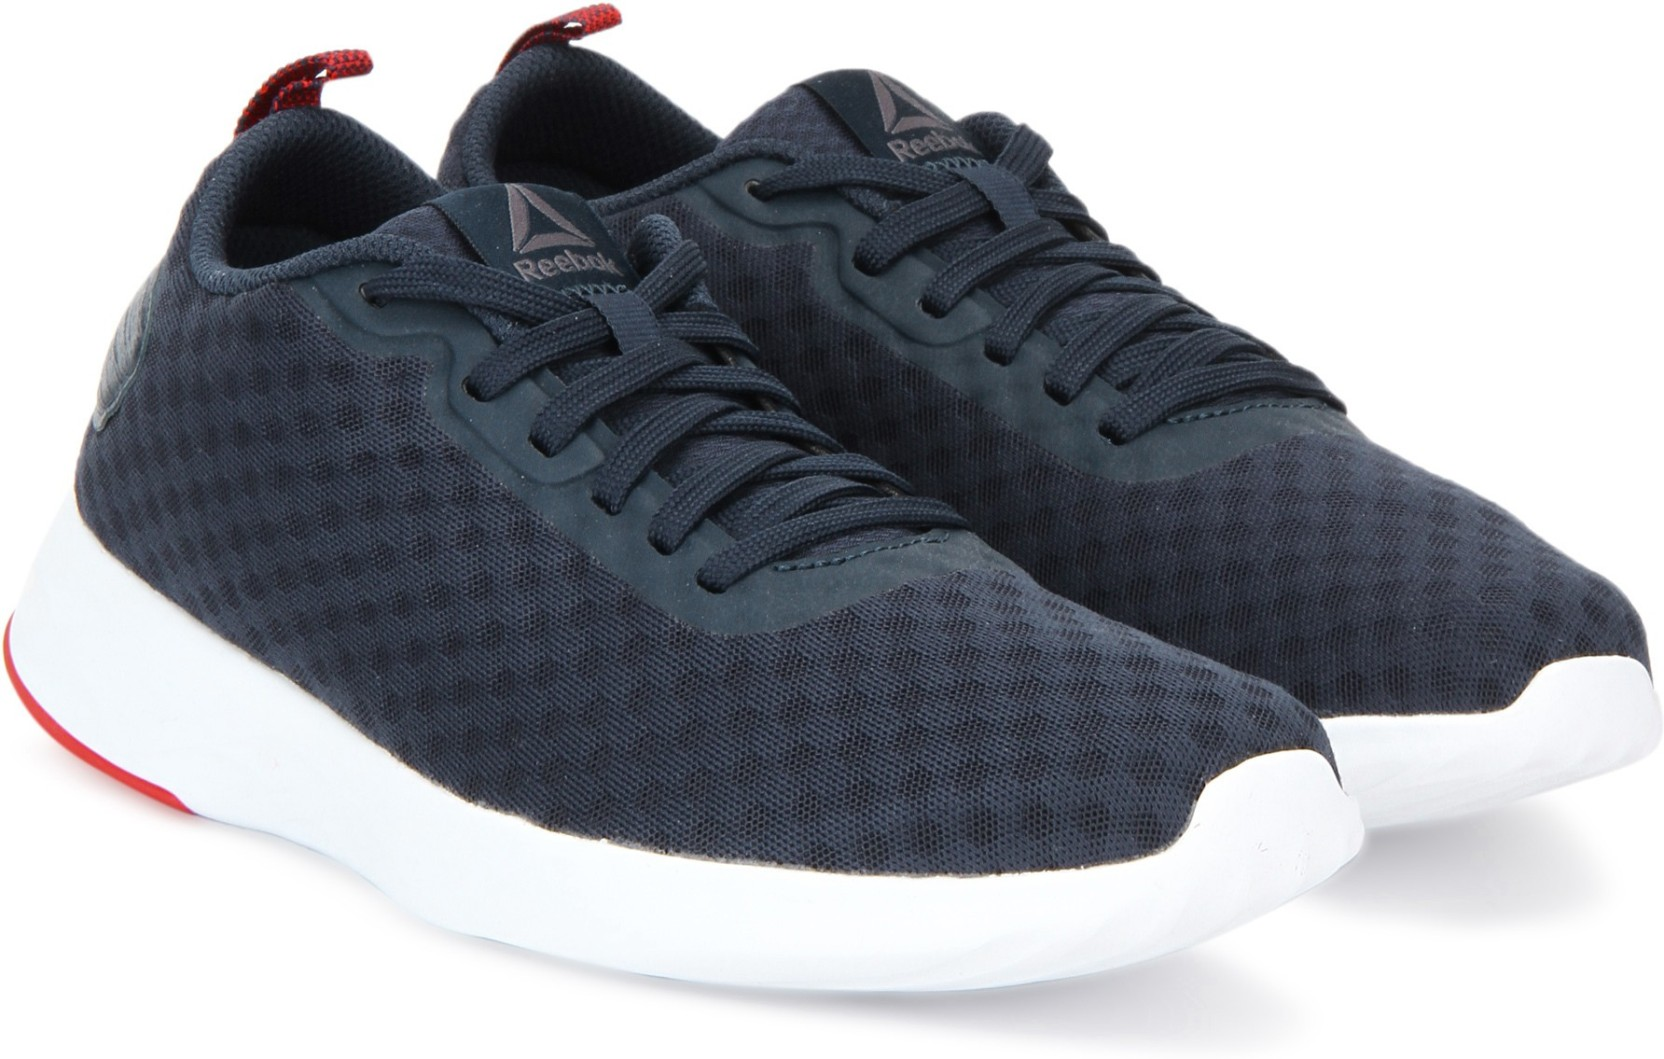 3d1f980df06 REEBOK ASTRORIDE SOUL Walking Shoes For Men - Buy COLL NAVY PRIMAL ...